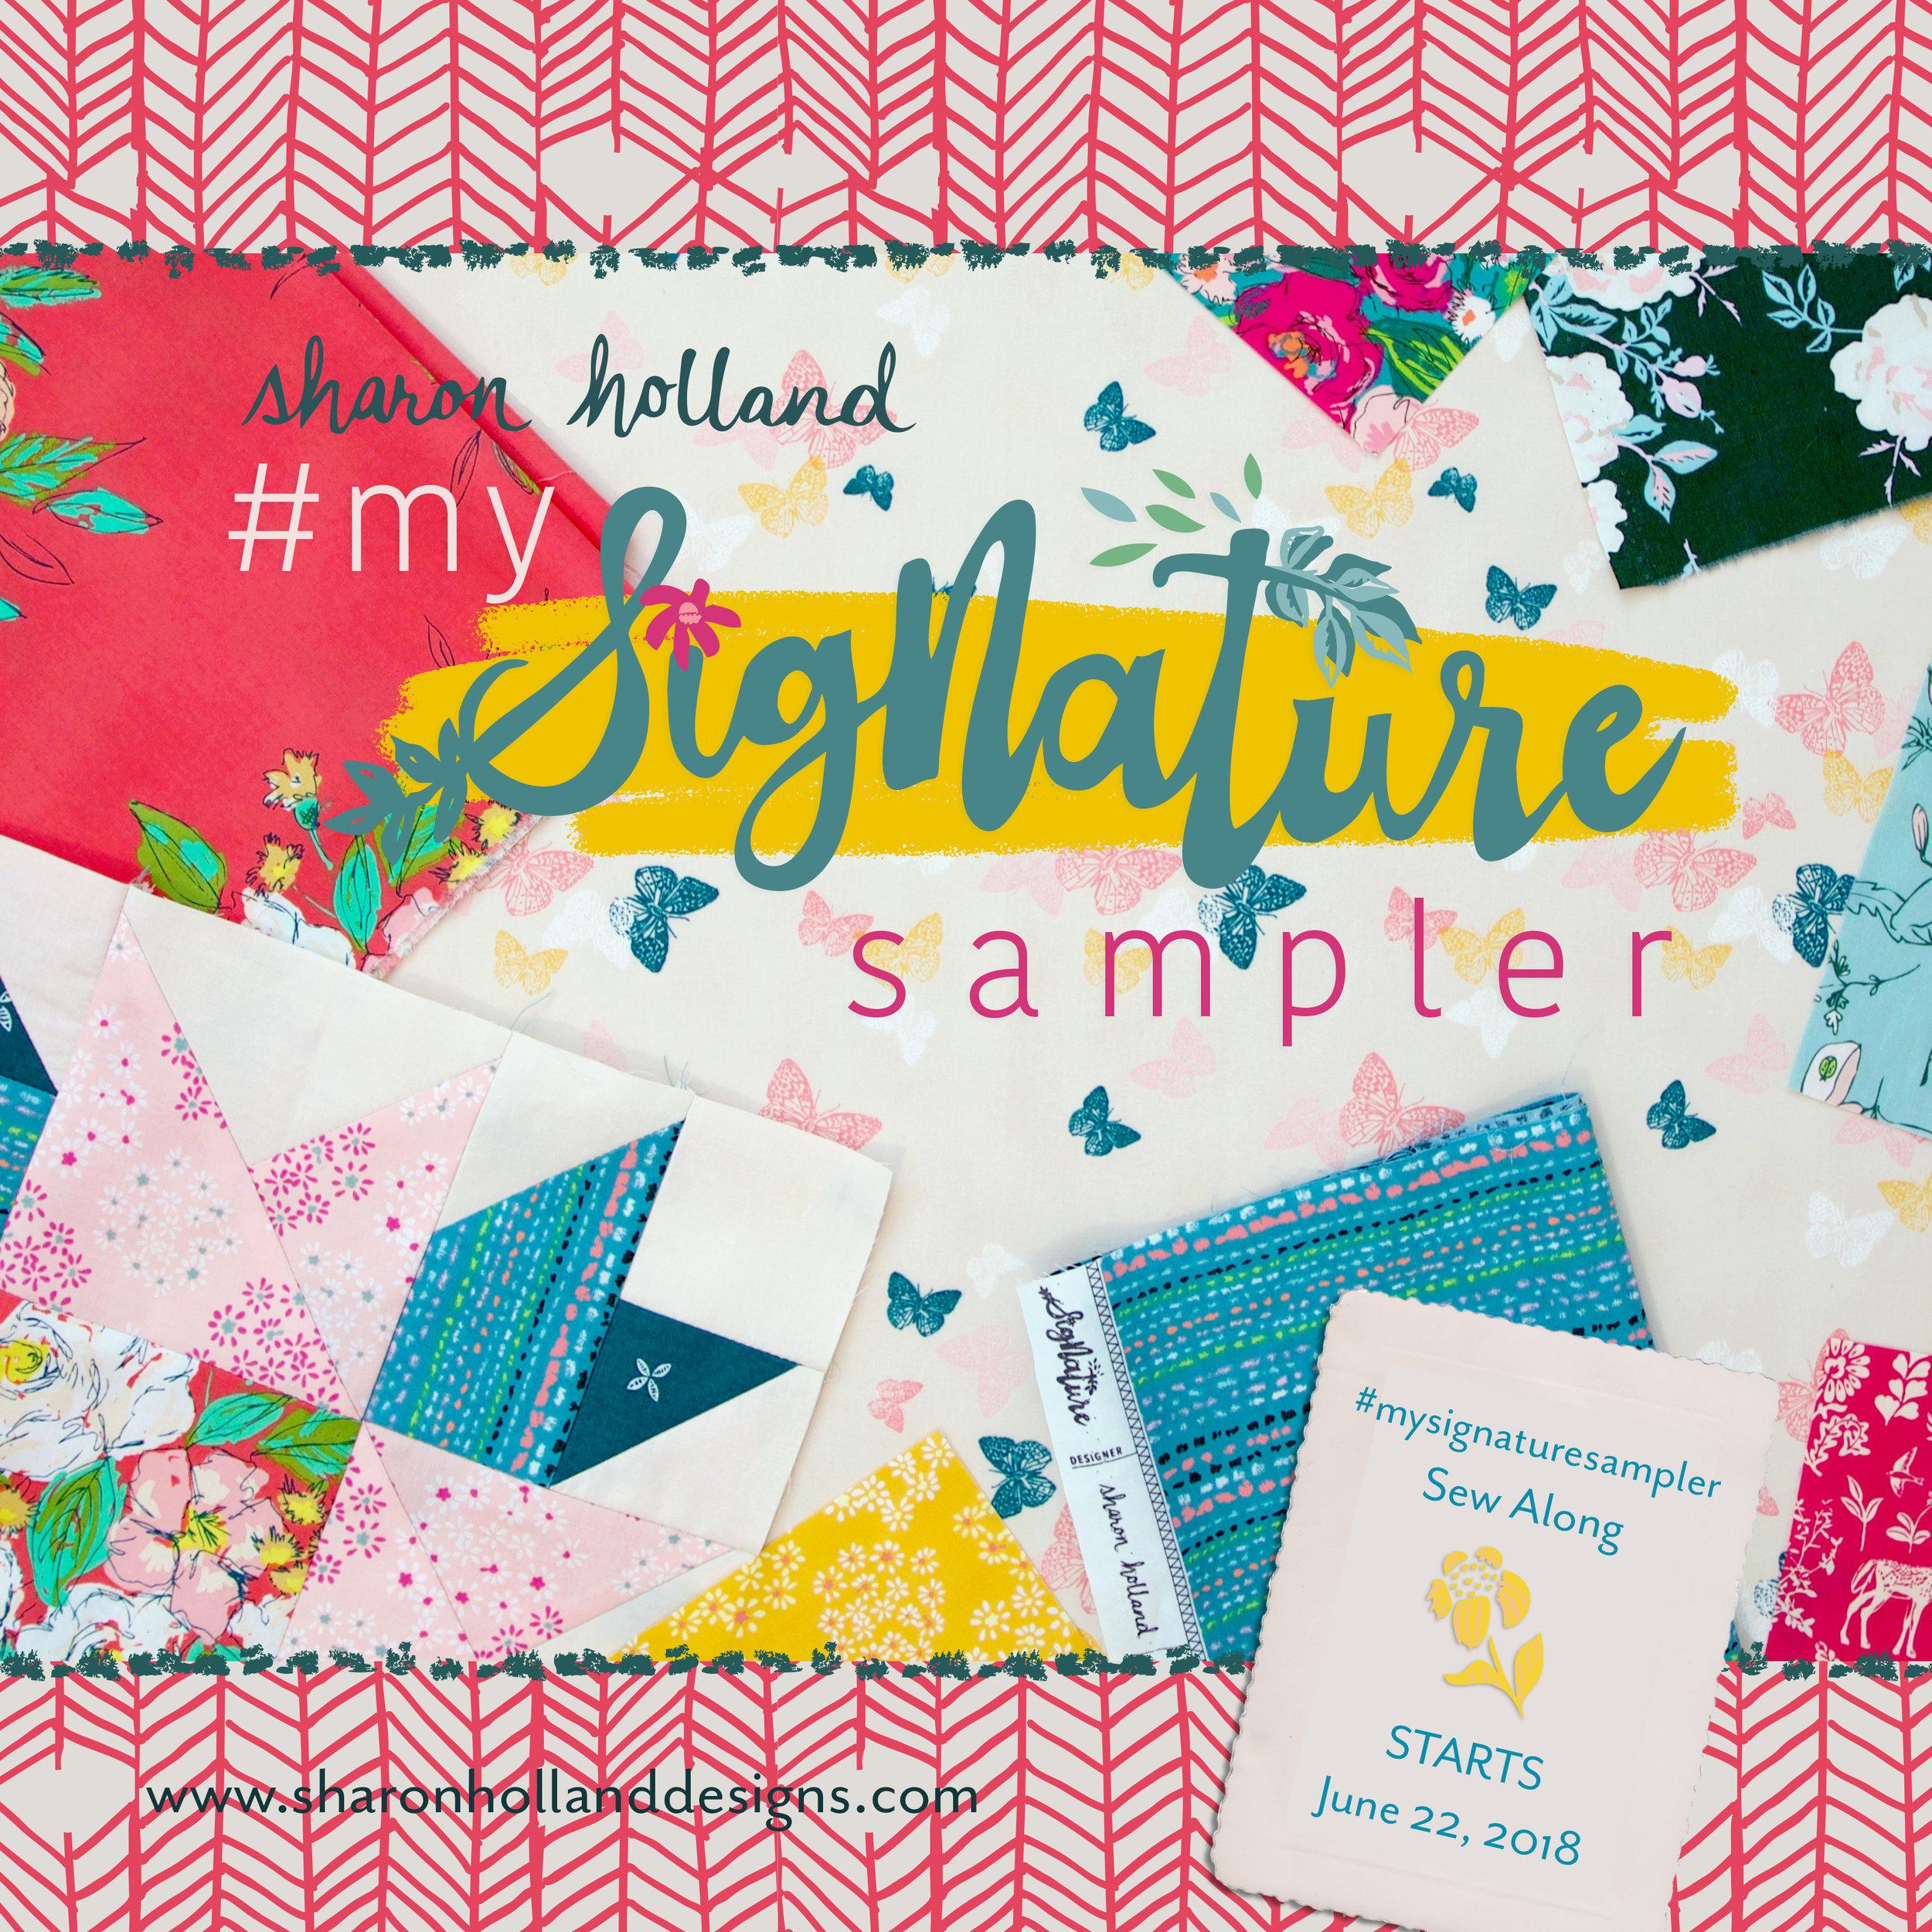 My Signature Sampler Graphics Sq.jpg